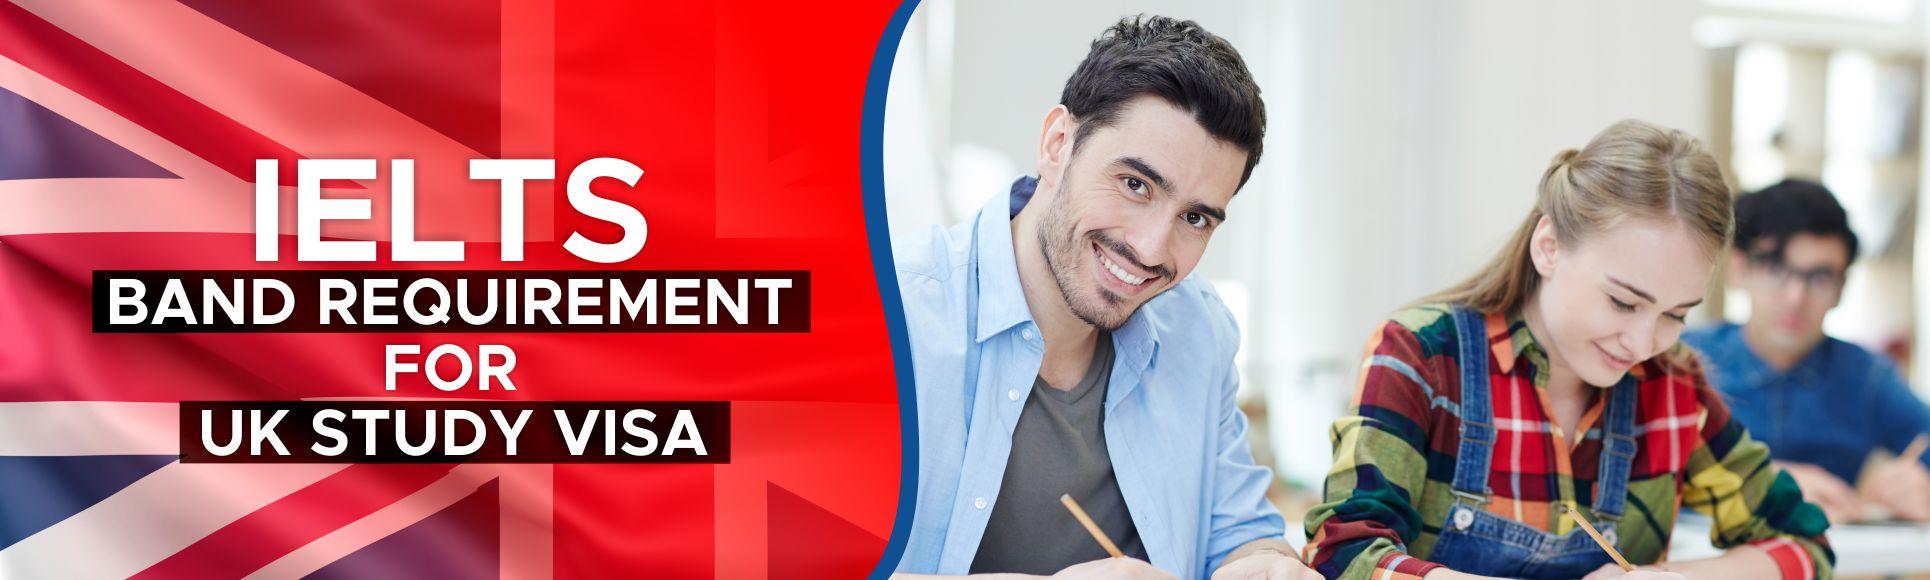 IELTS Band Requirement for UK Study Visa